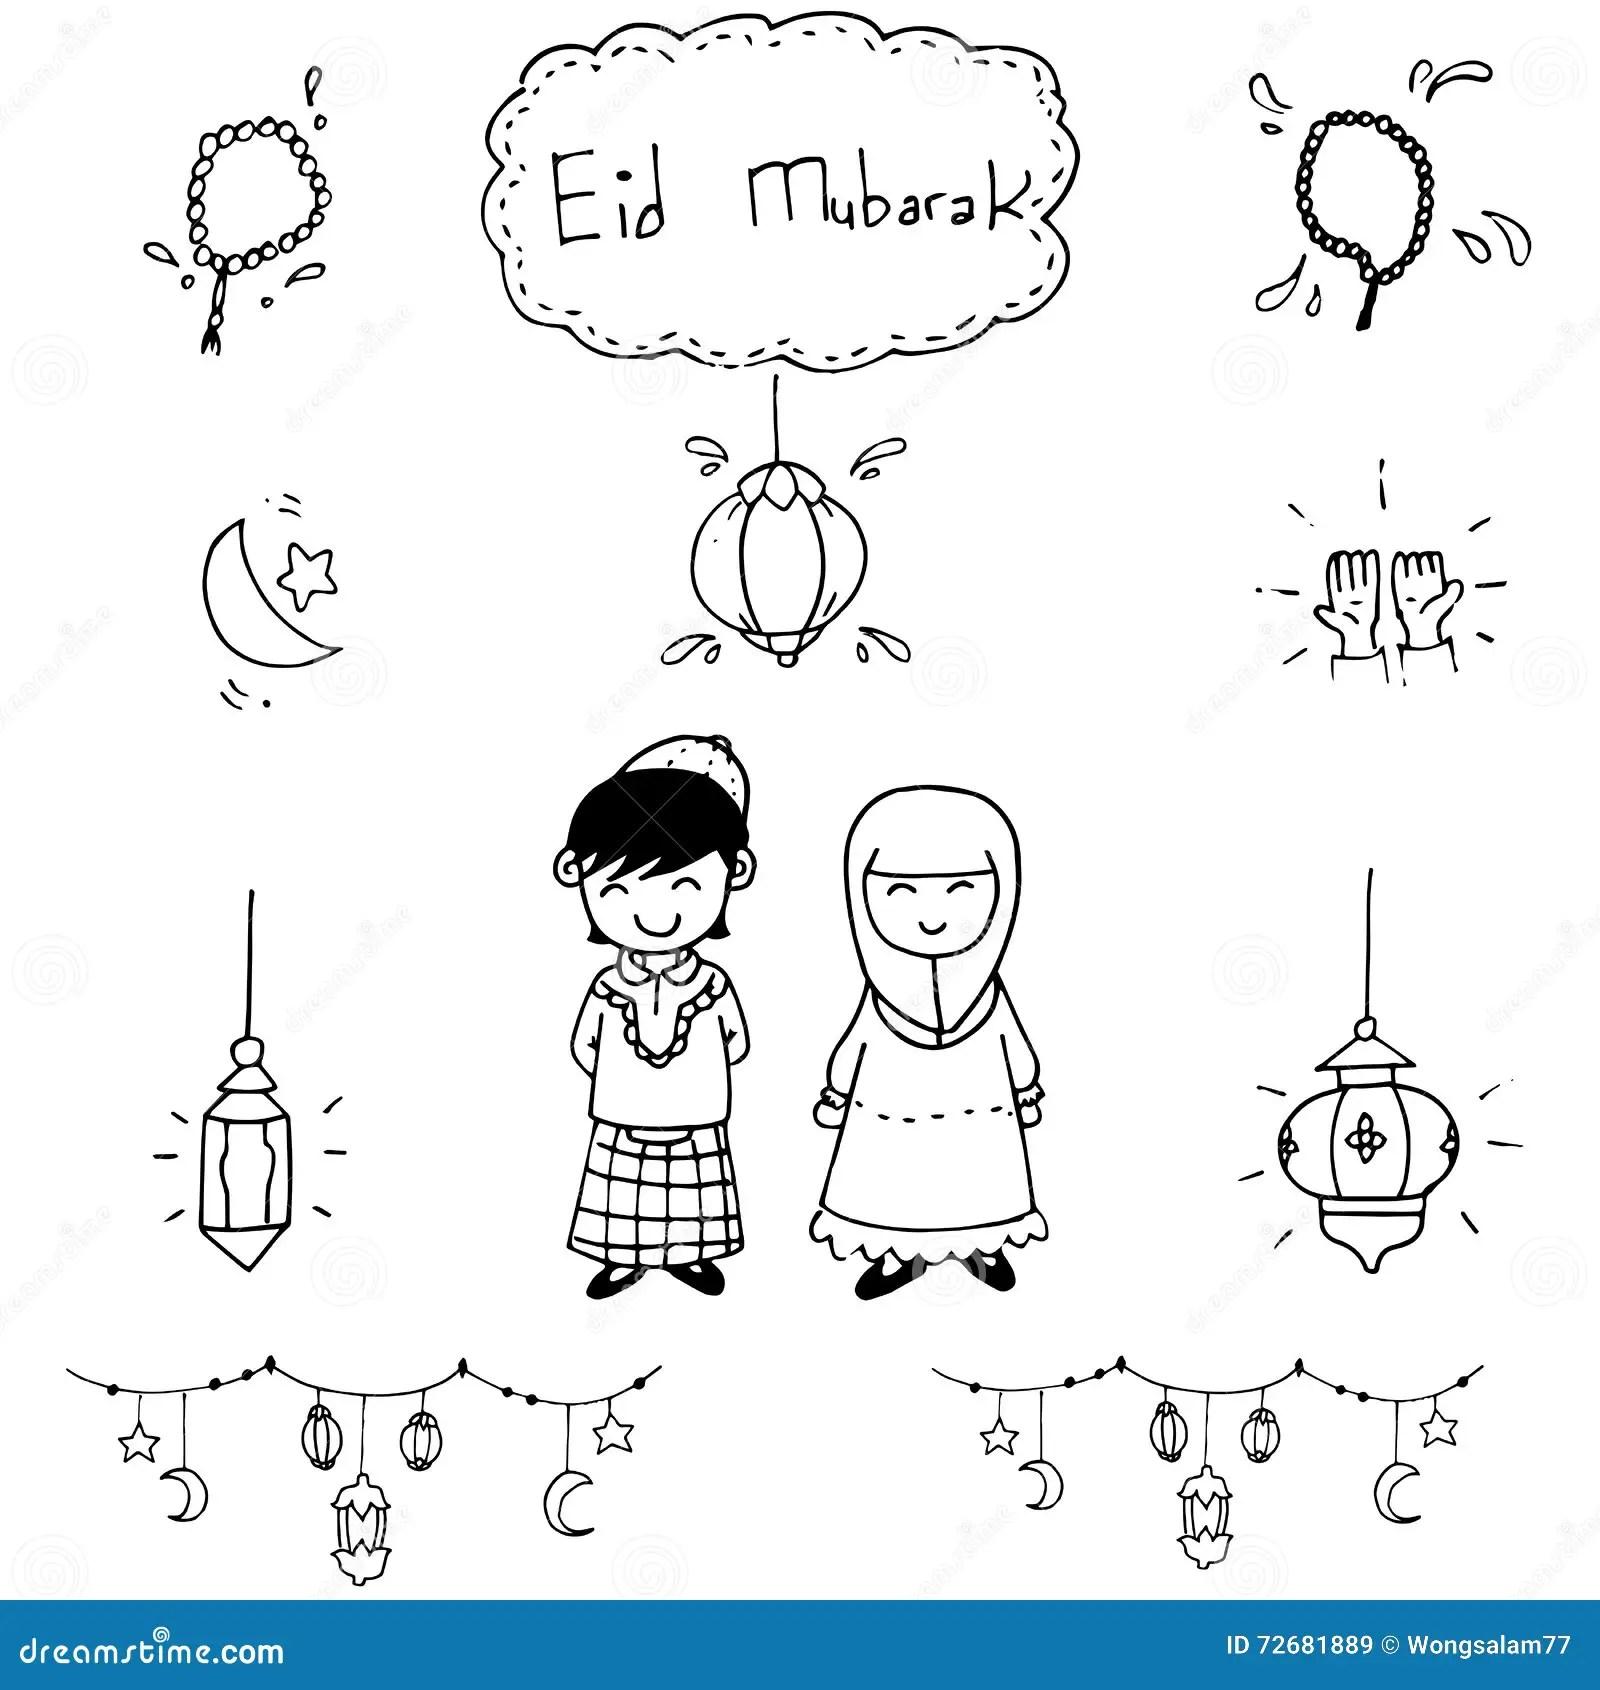 Eid Mubarak Doodle Cartoon Vector